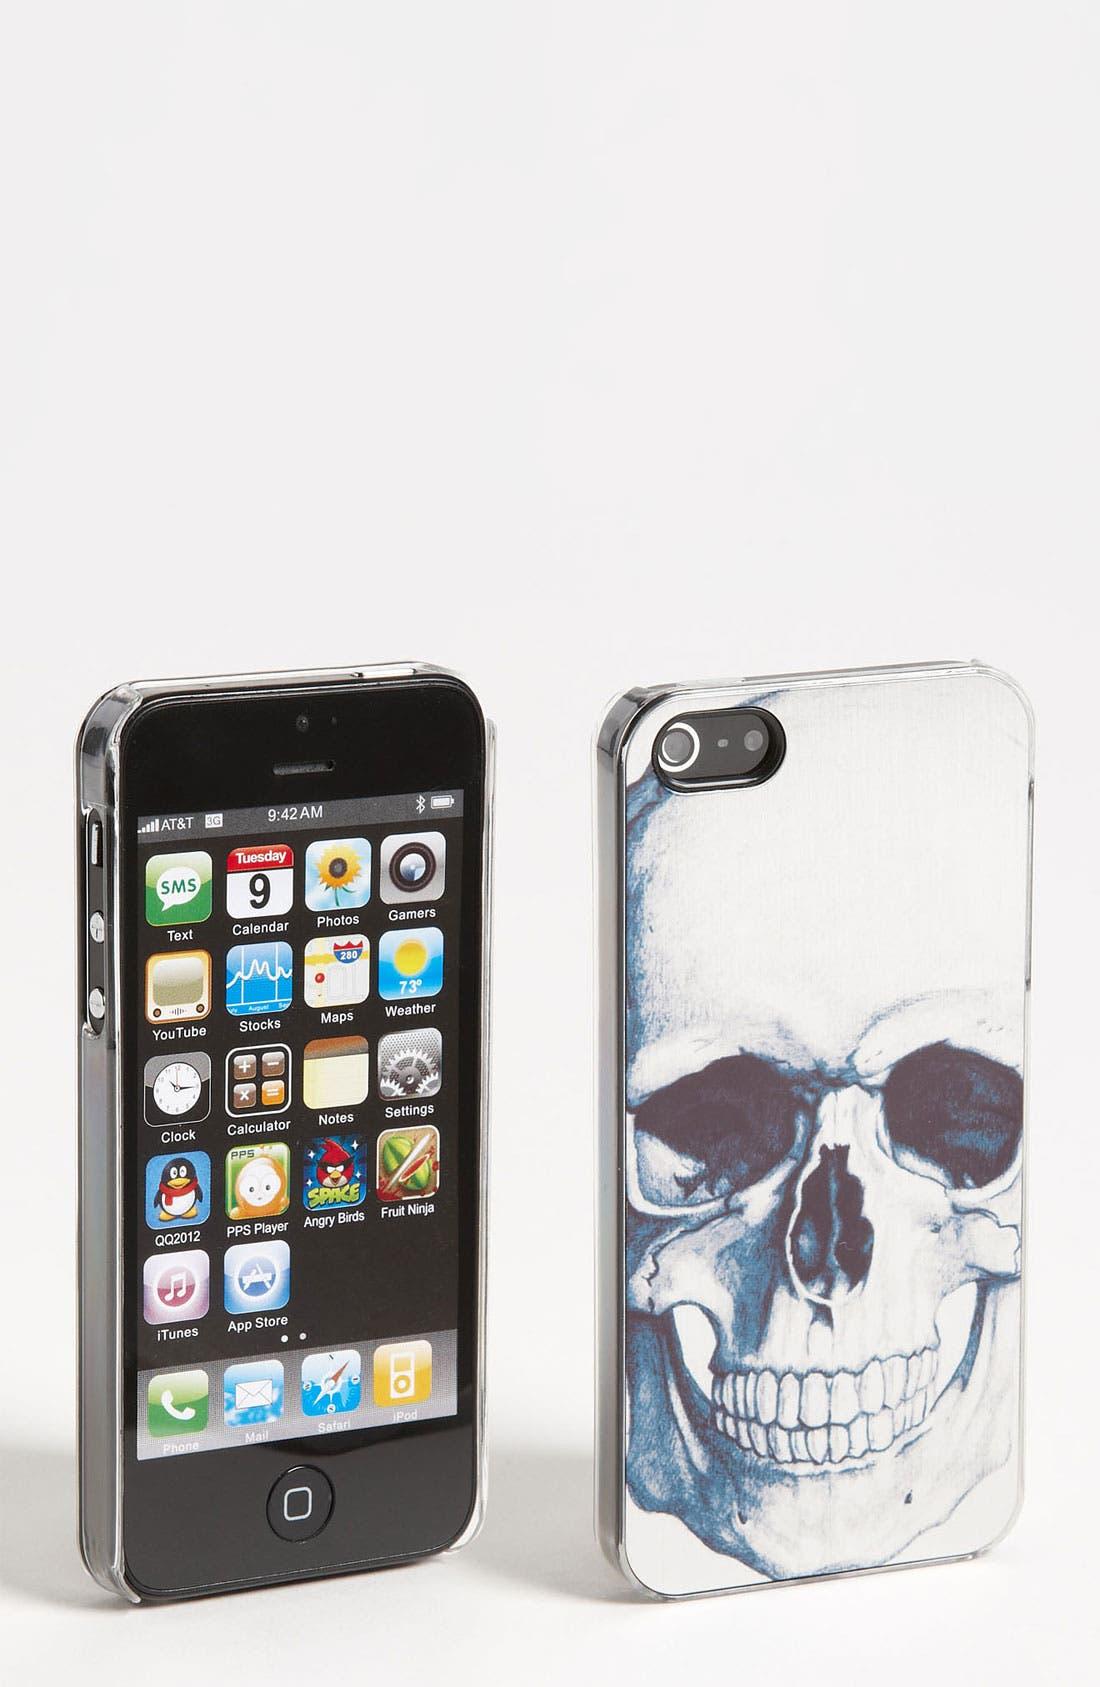 Main Image - ZERO GRAVITY iPhone 5 Case